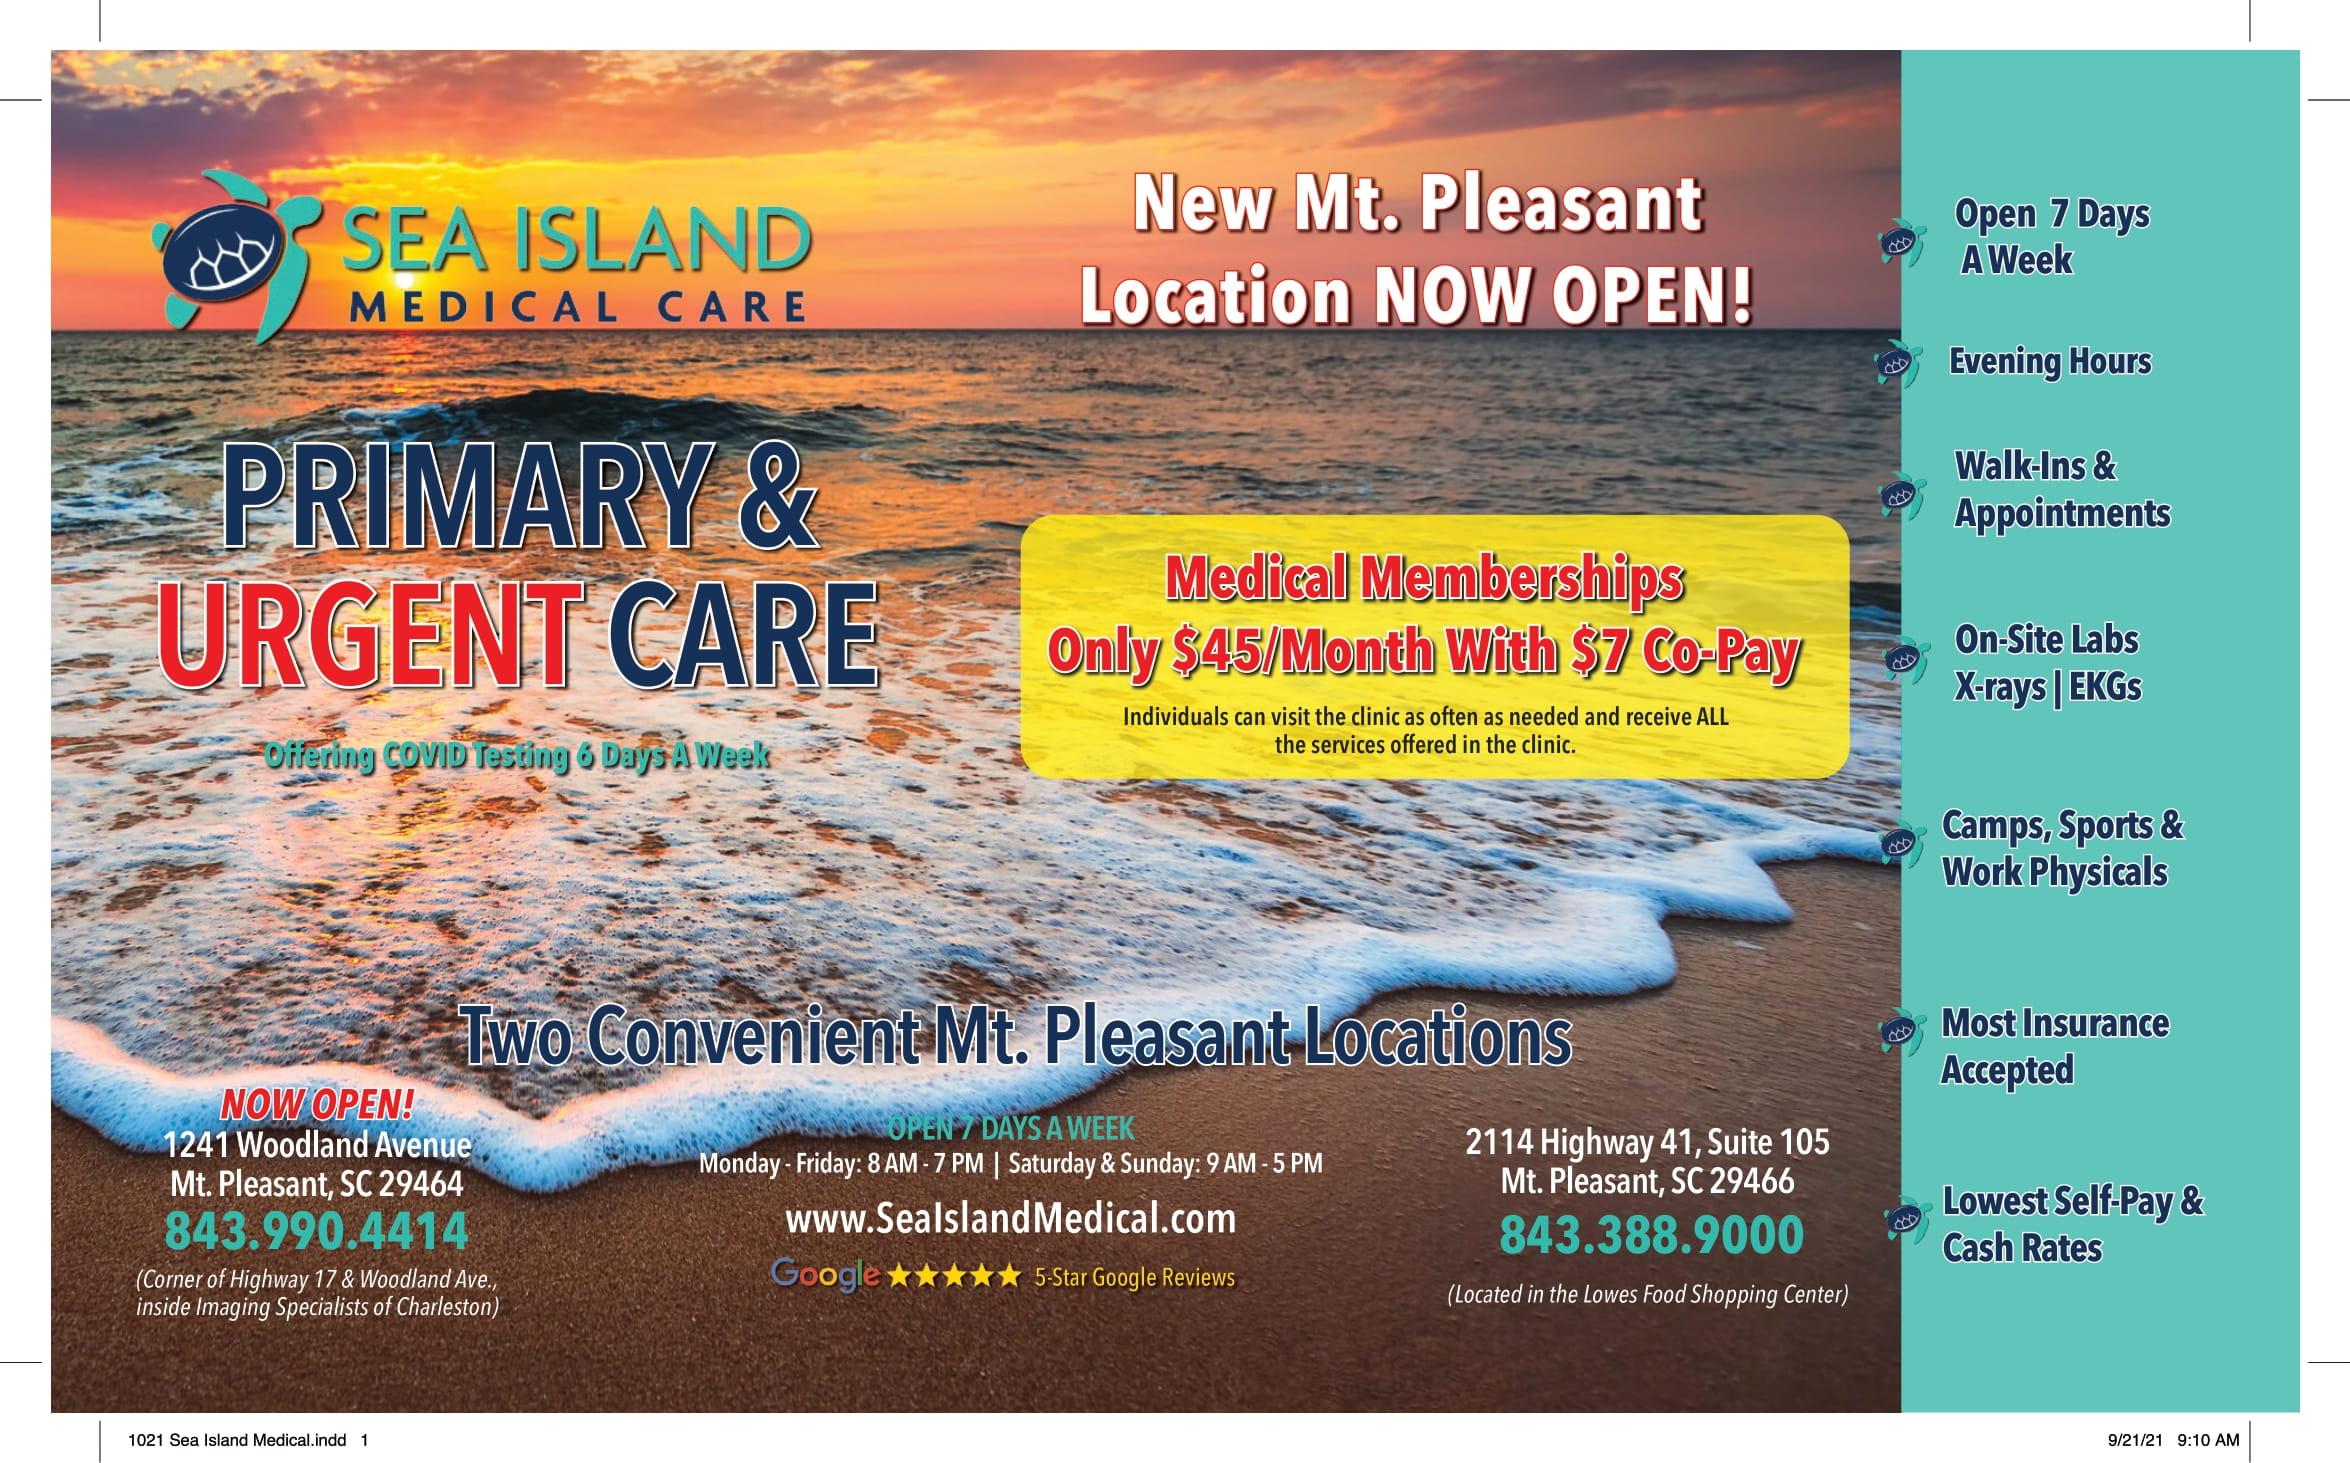 1021 Sea Island Medical 1